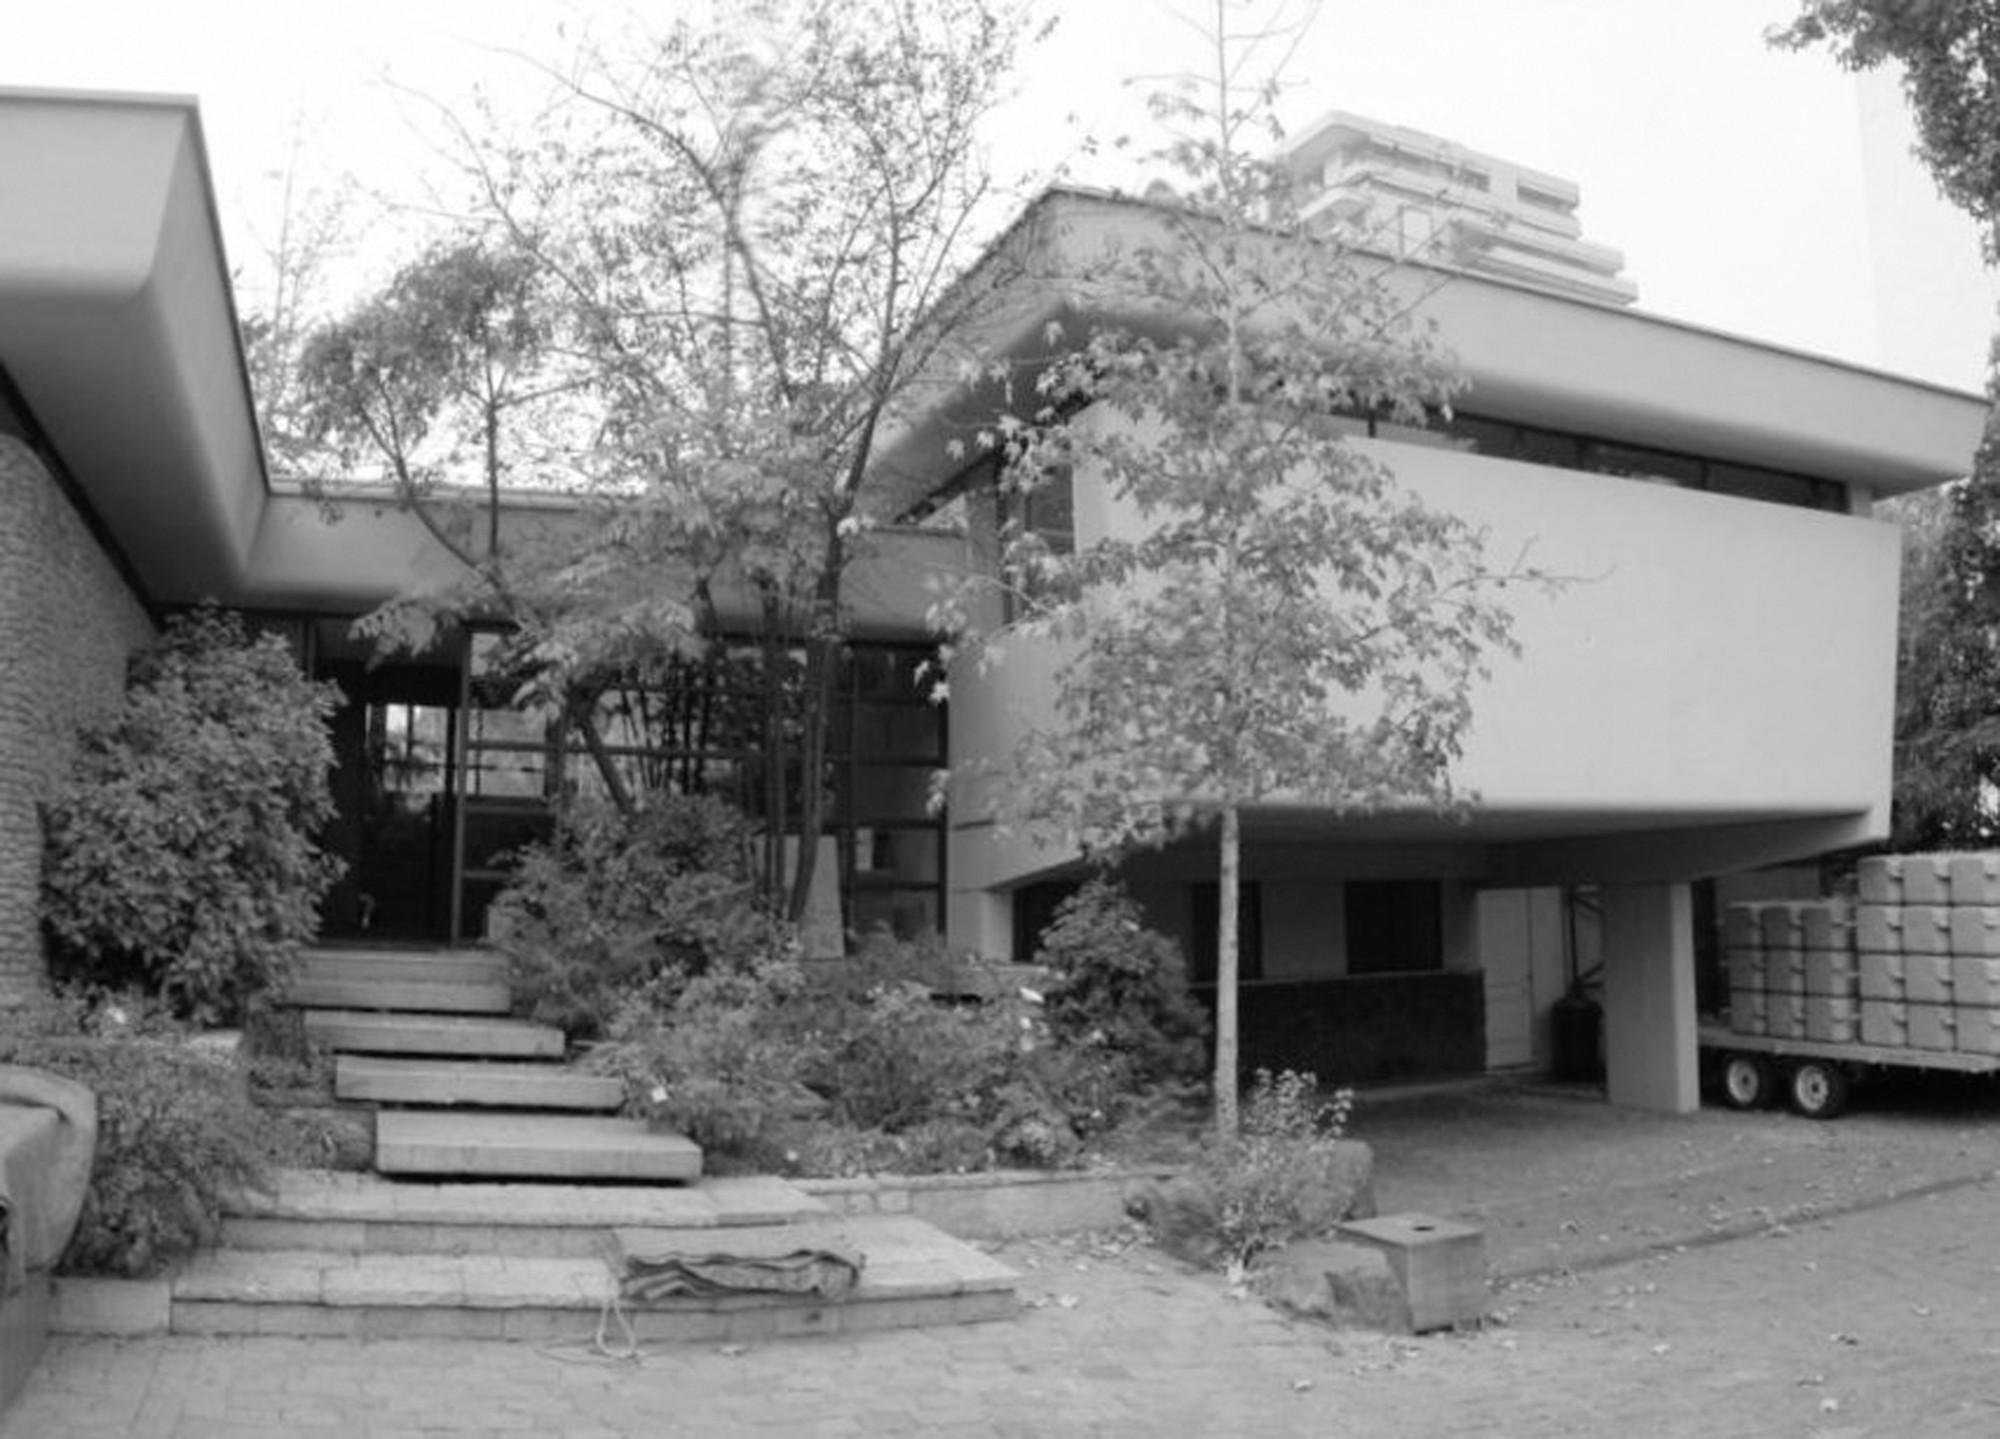 Clásicos de Arquitectura: Casa Marticorena-García / Hugo Cabezas Vatcky, Eliana Scaramelli Marconi, © Pablo Altikes